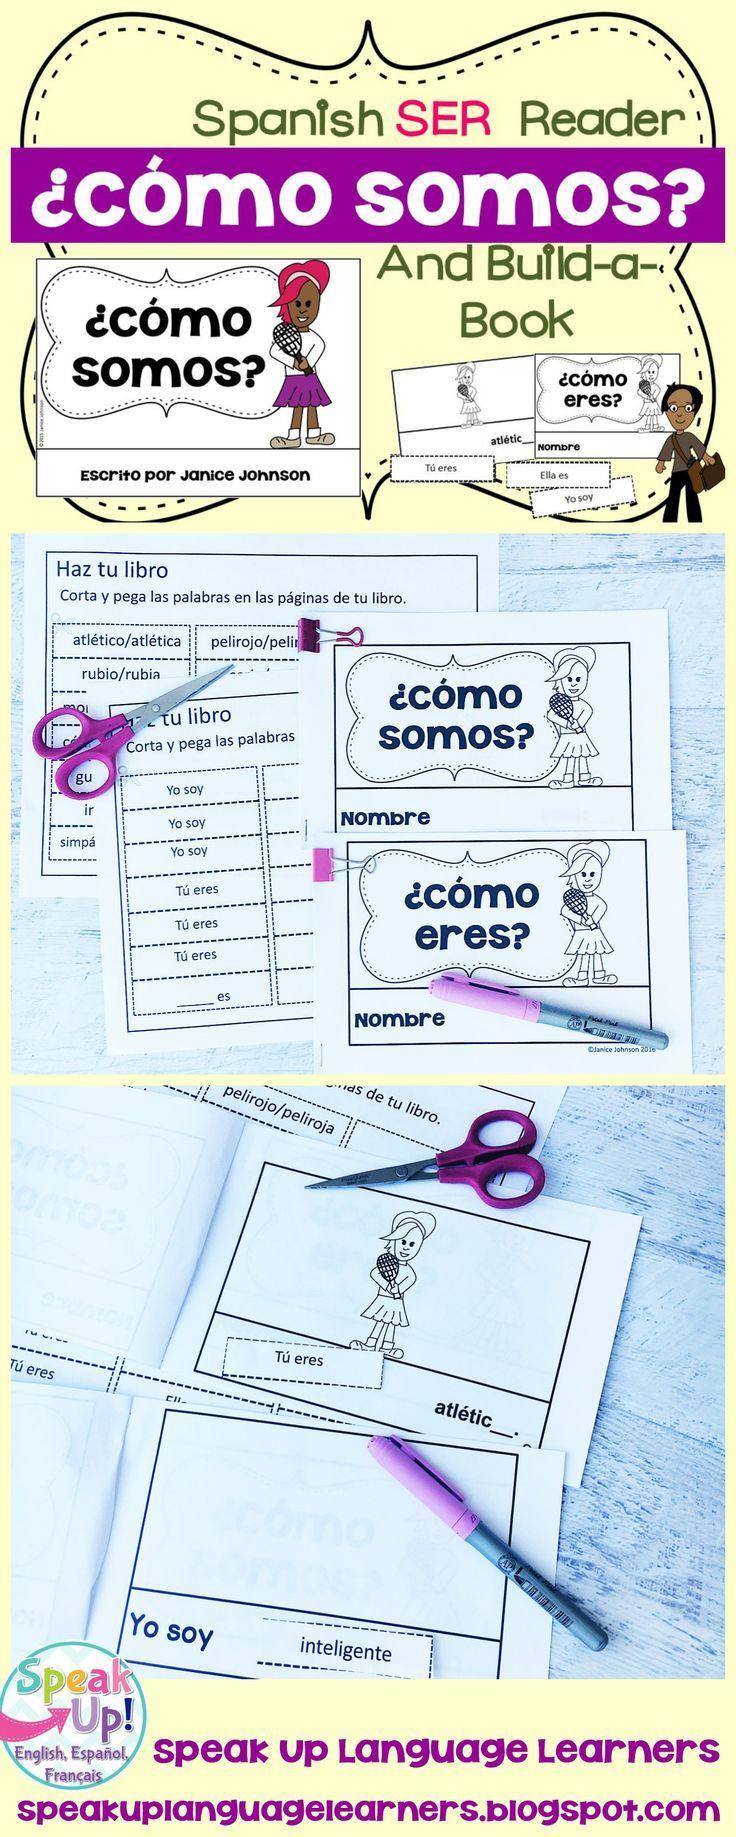 Como Somos Spanish Verb Ser Adjective Reader Build A Book Verb Ser Spanish Verb Ser Spanish Verbs [ 1837 x 736 Pixel ]